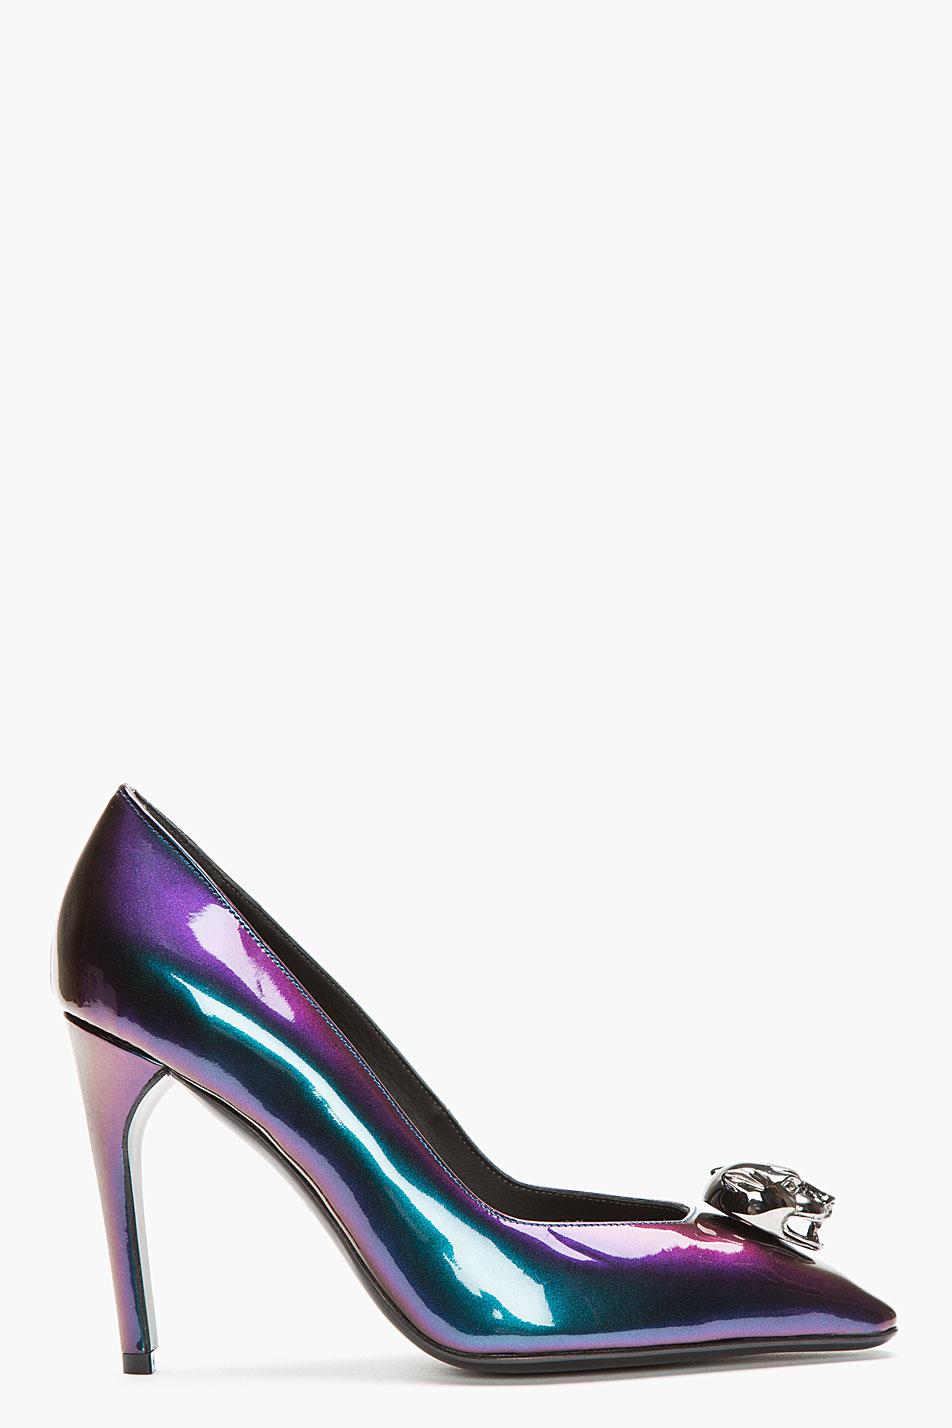 Mugler purple iridescent leather panther pumps